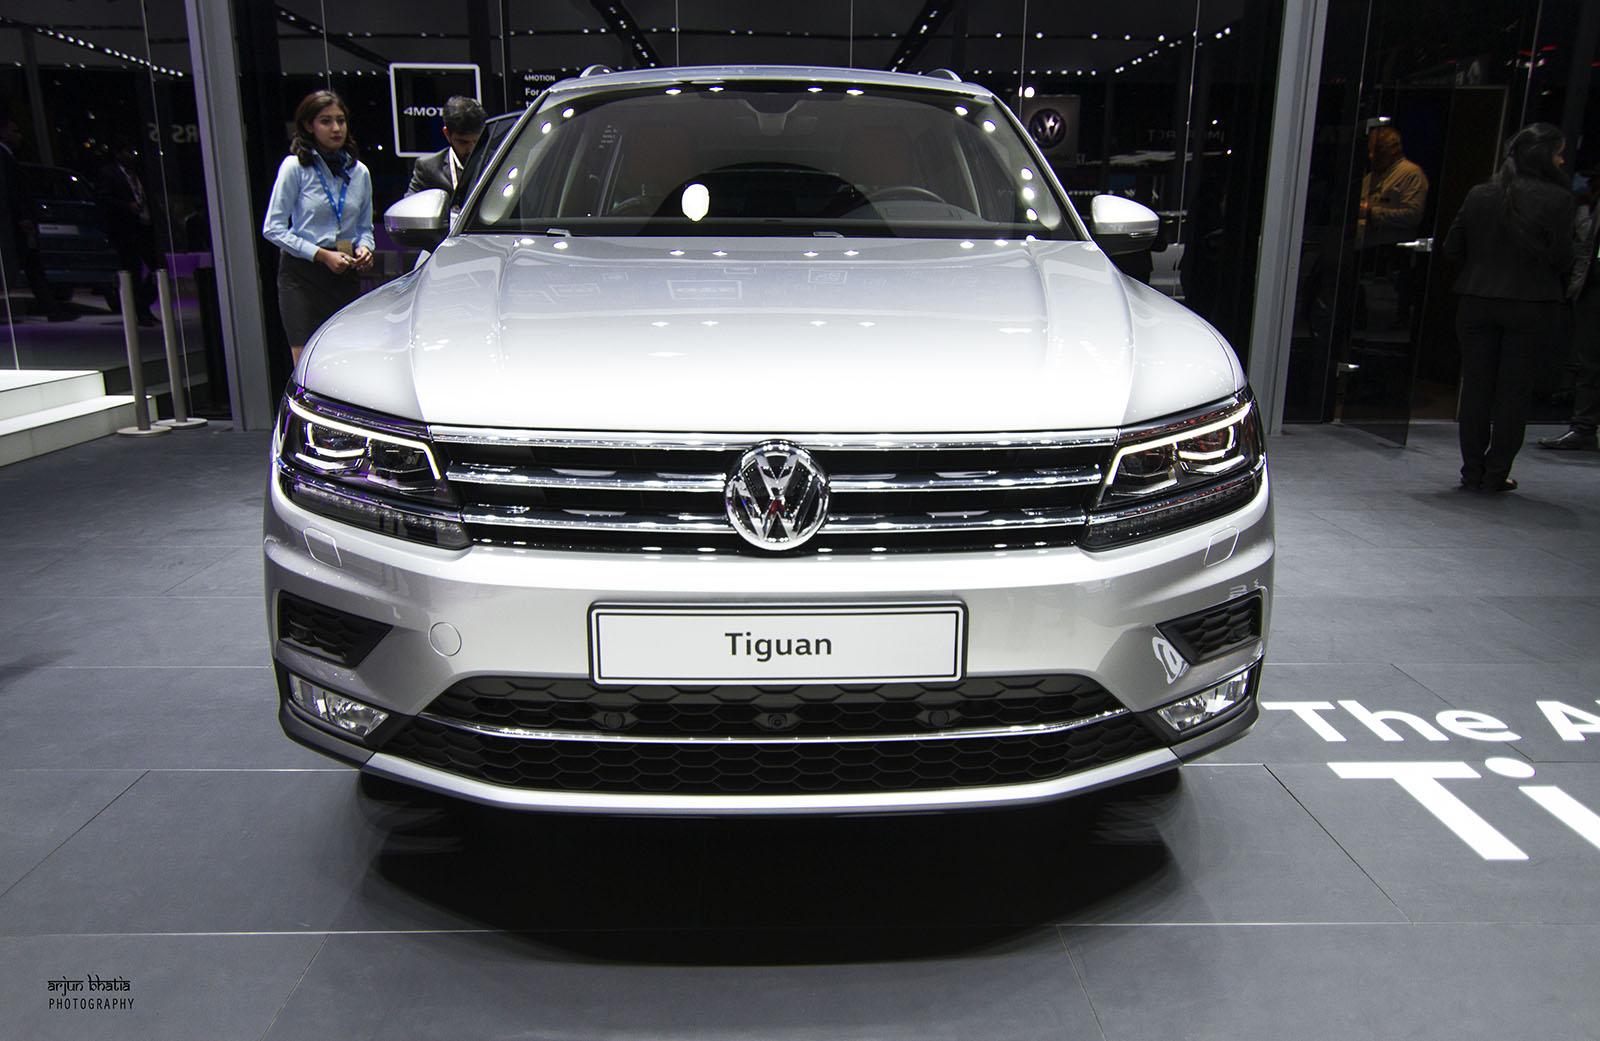 Volkswagen Tiguan Delhi Auto Expo 2016 1